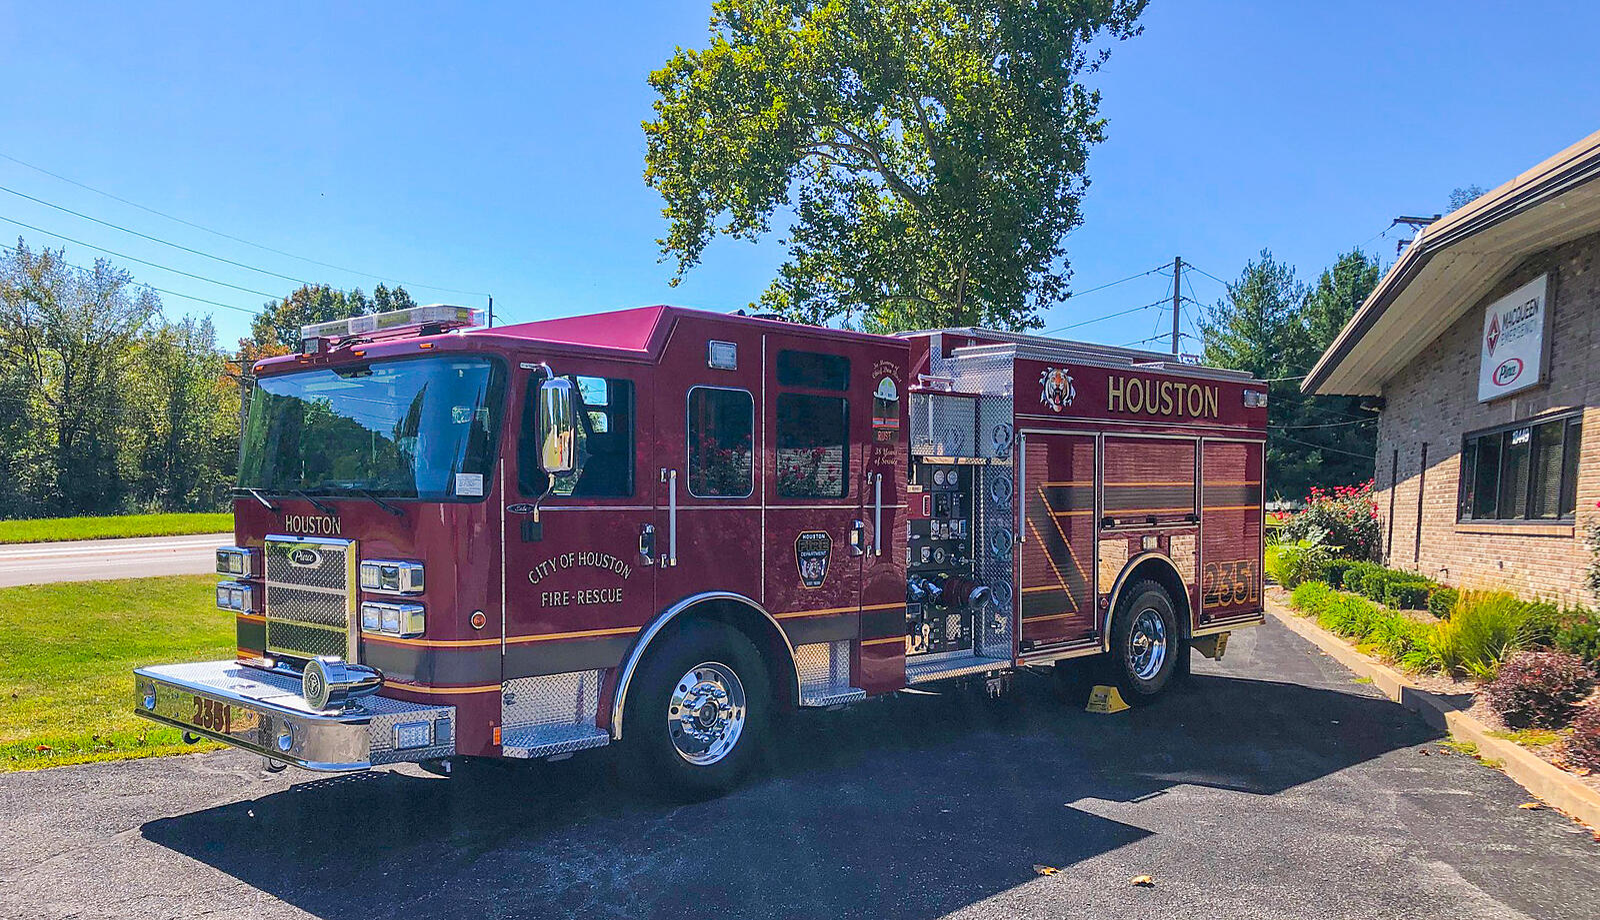 Houston Fire Department - Pumper